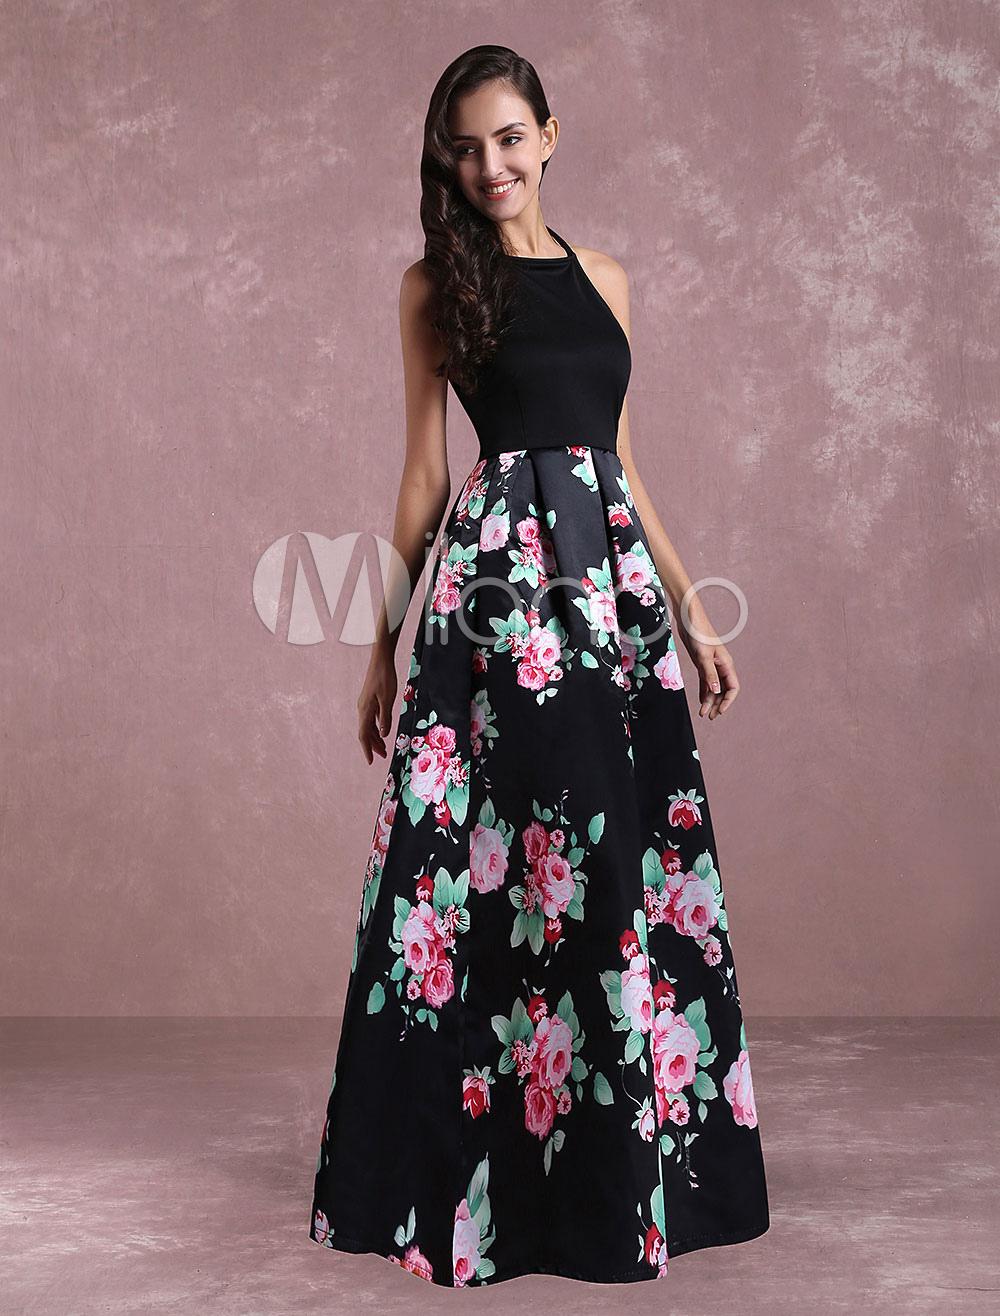 Flroal Maxi Dress Open Back Women's Sleeveless Casual Dress Cheap clothes, free shipping worldwide